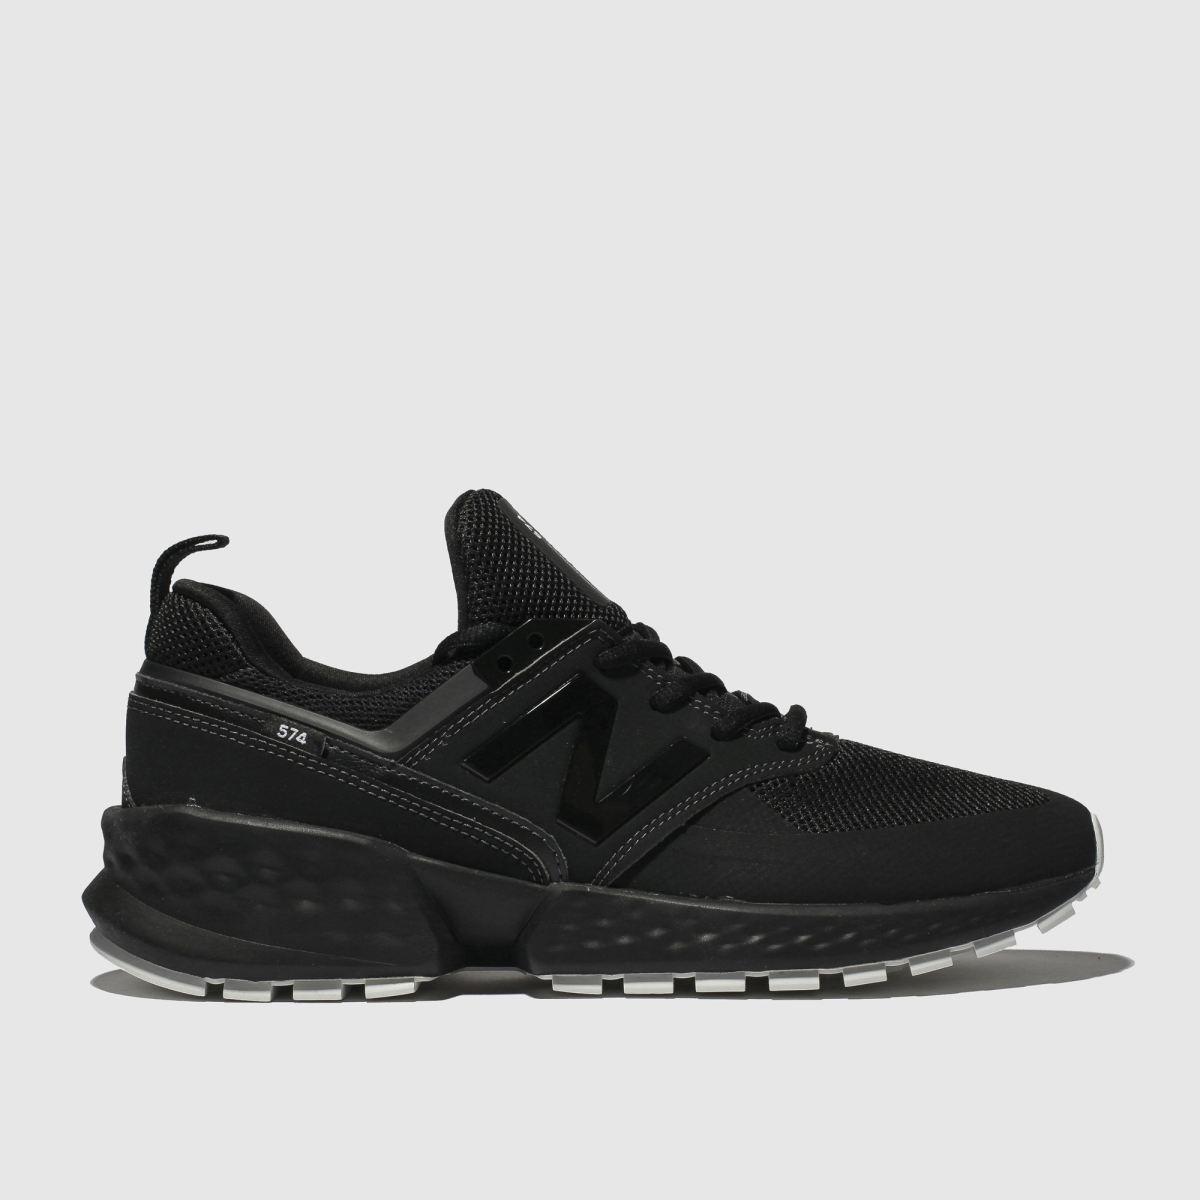 New Balance Black 574 V2 Trainers